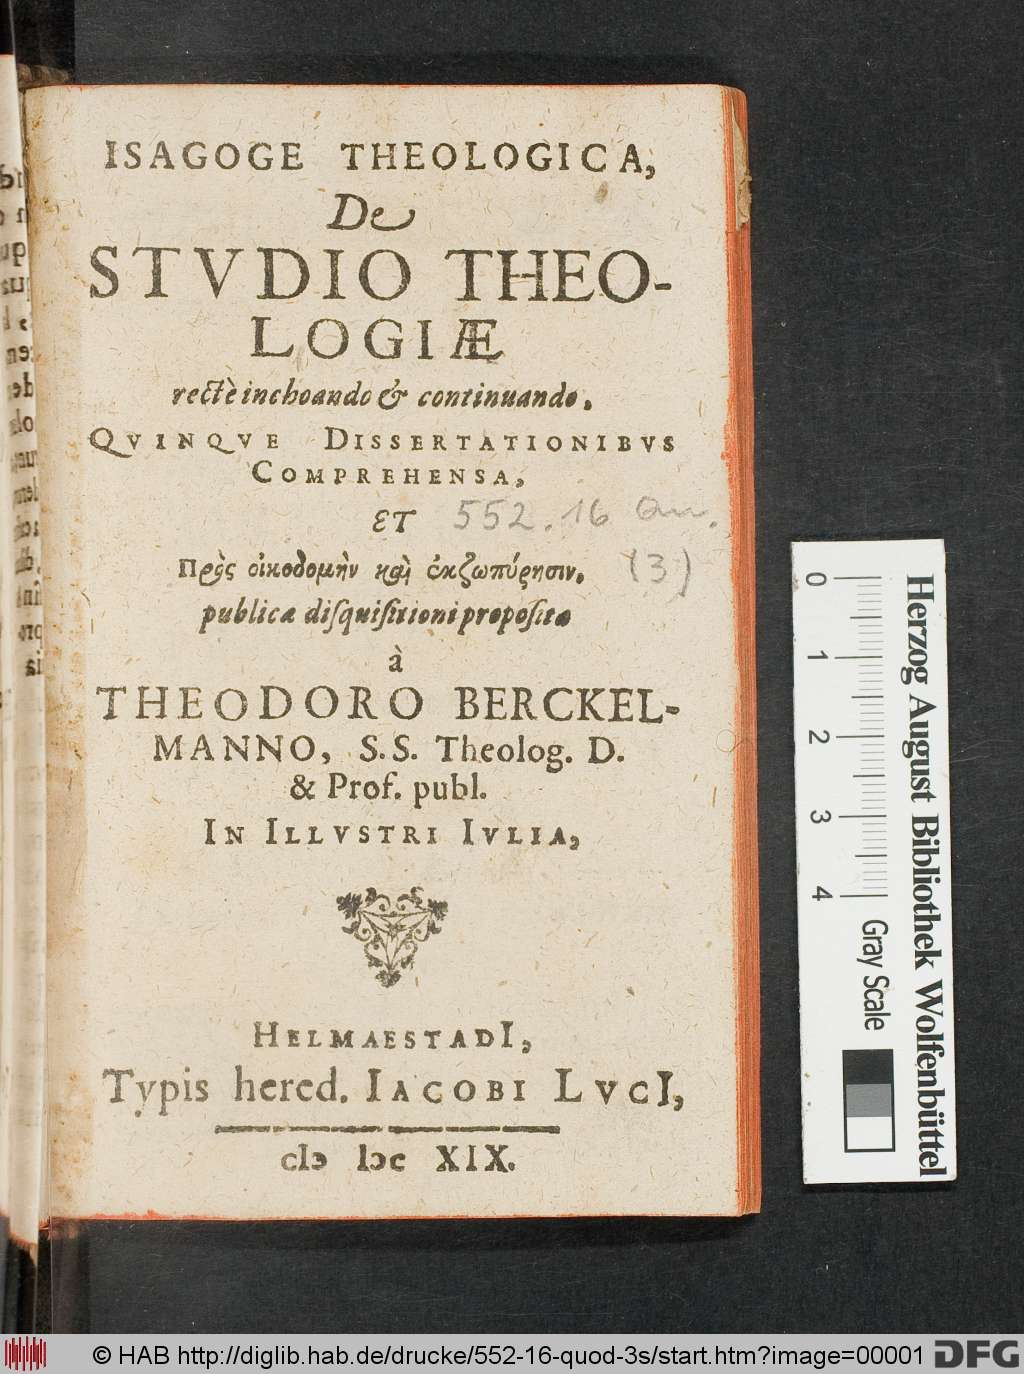 http://diglib.hab.de/drucke/552-16-quod-3s/00001.jpg